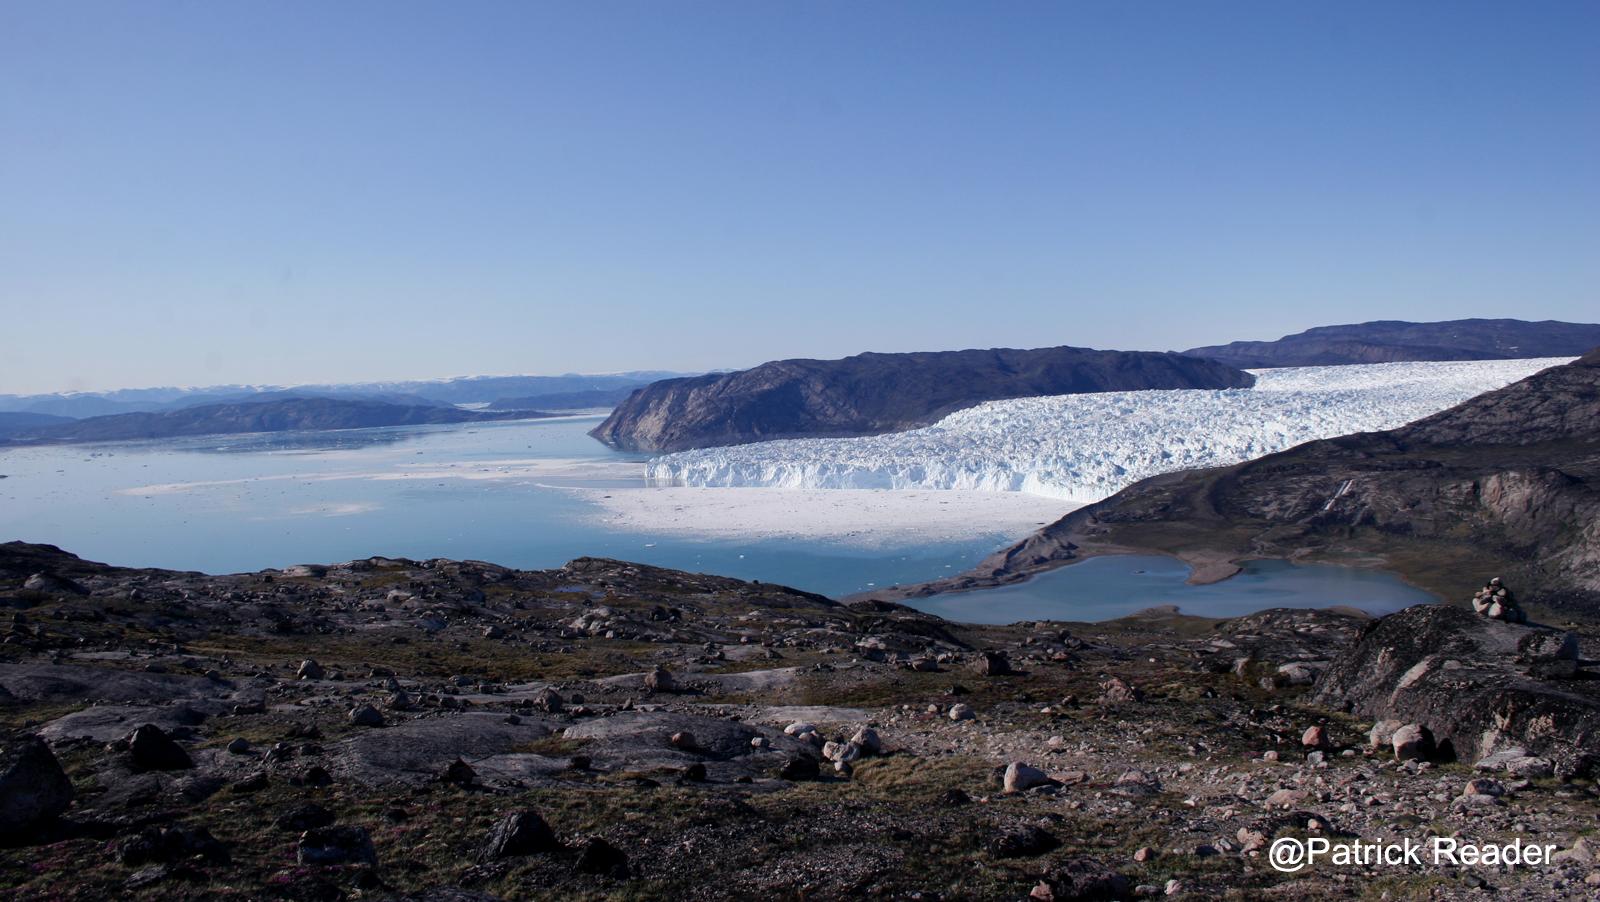 Breathtaking Greenlandic landscape! We Want More!